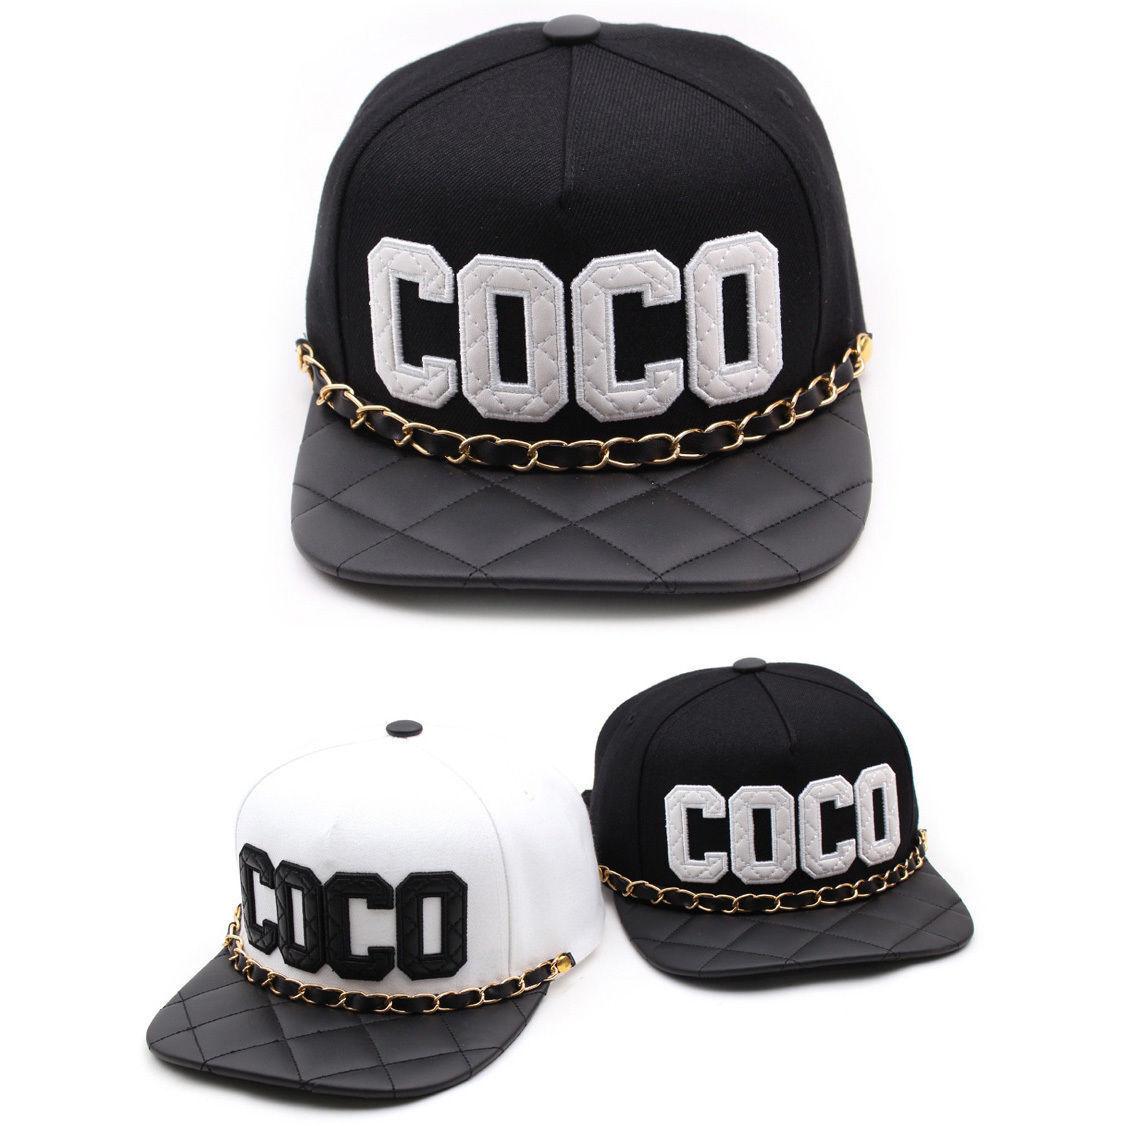 Unisex Casual Mens Womens Teamlife COCO Chain Hiphop Casual Unisex Baseball Cap Strapback Hats d659d6